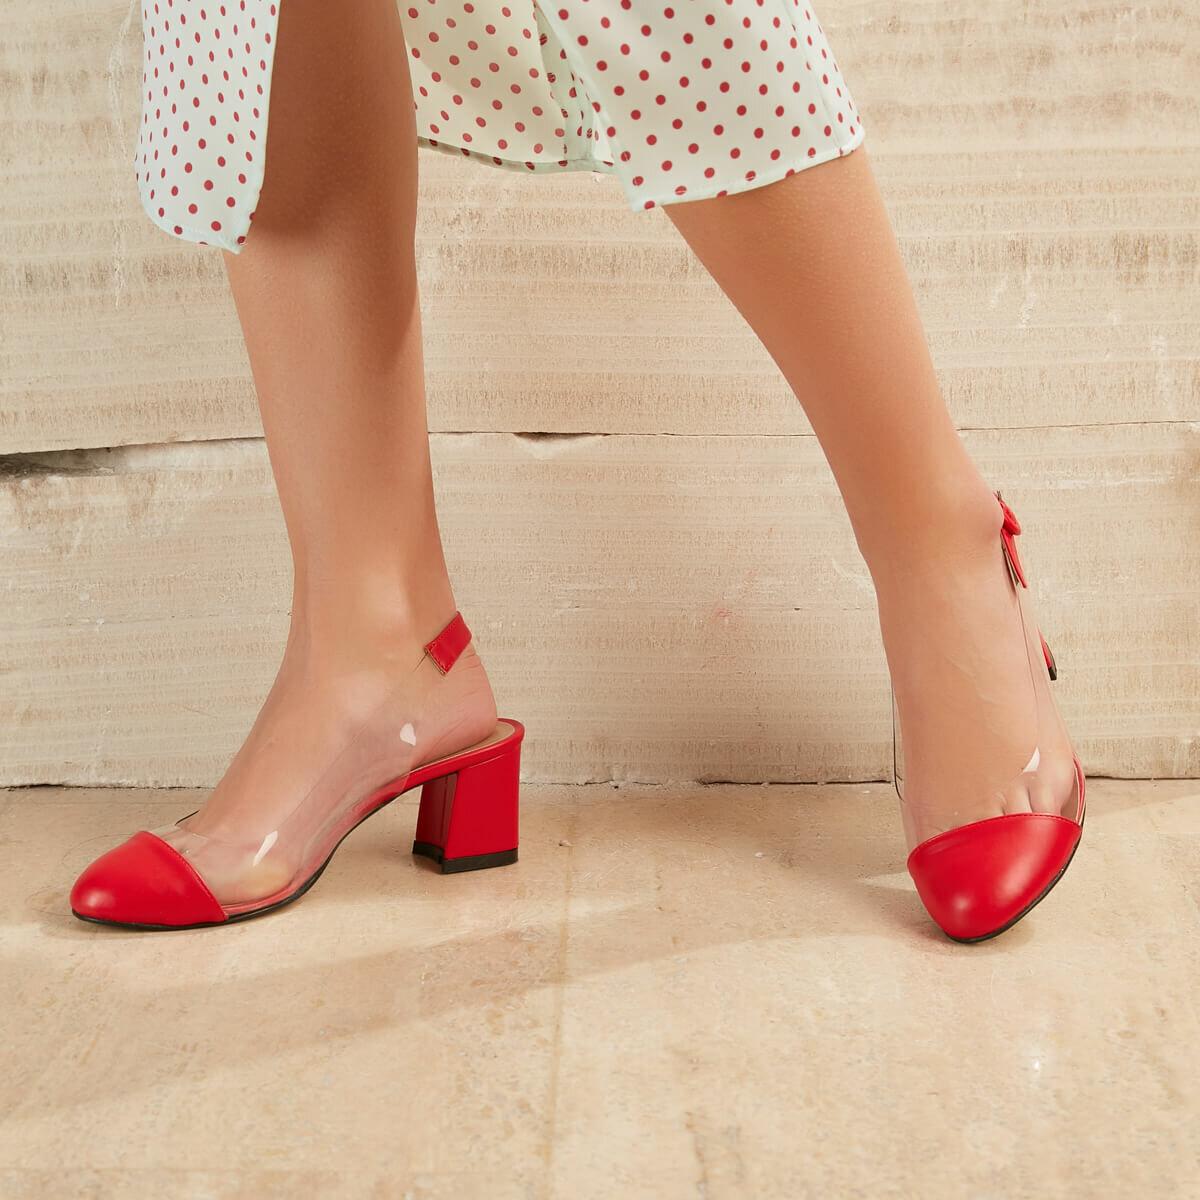 FLO Women Heeled Shoes Red Fashion Ladies Heels Dress Light High Classic Heels Shoes Туфли на высоком каблуке OLIVER33Z CILT BUTIGO